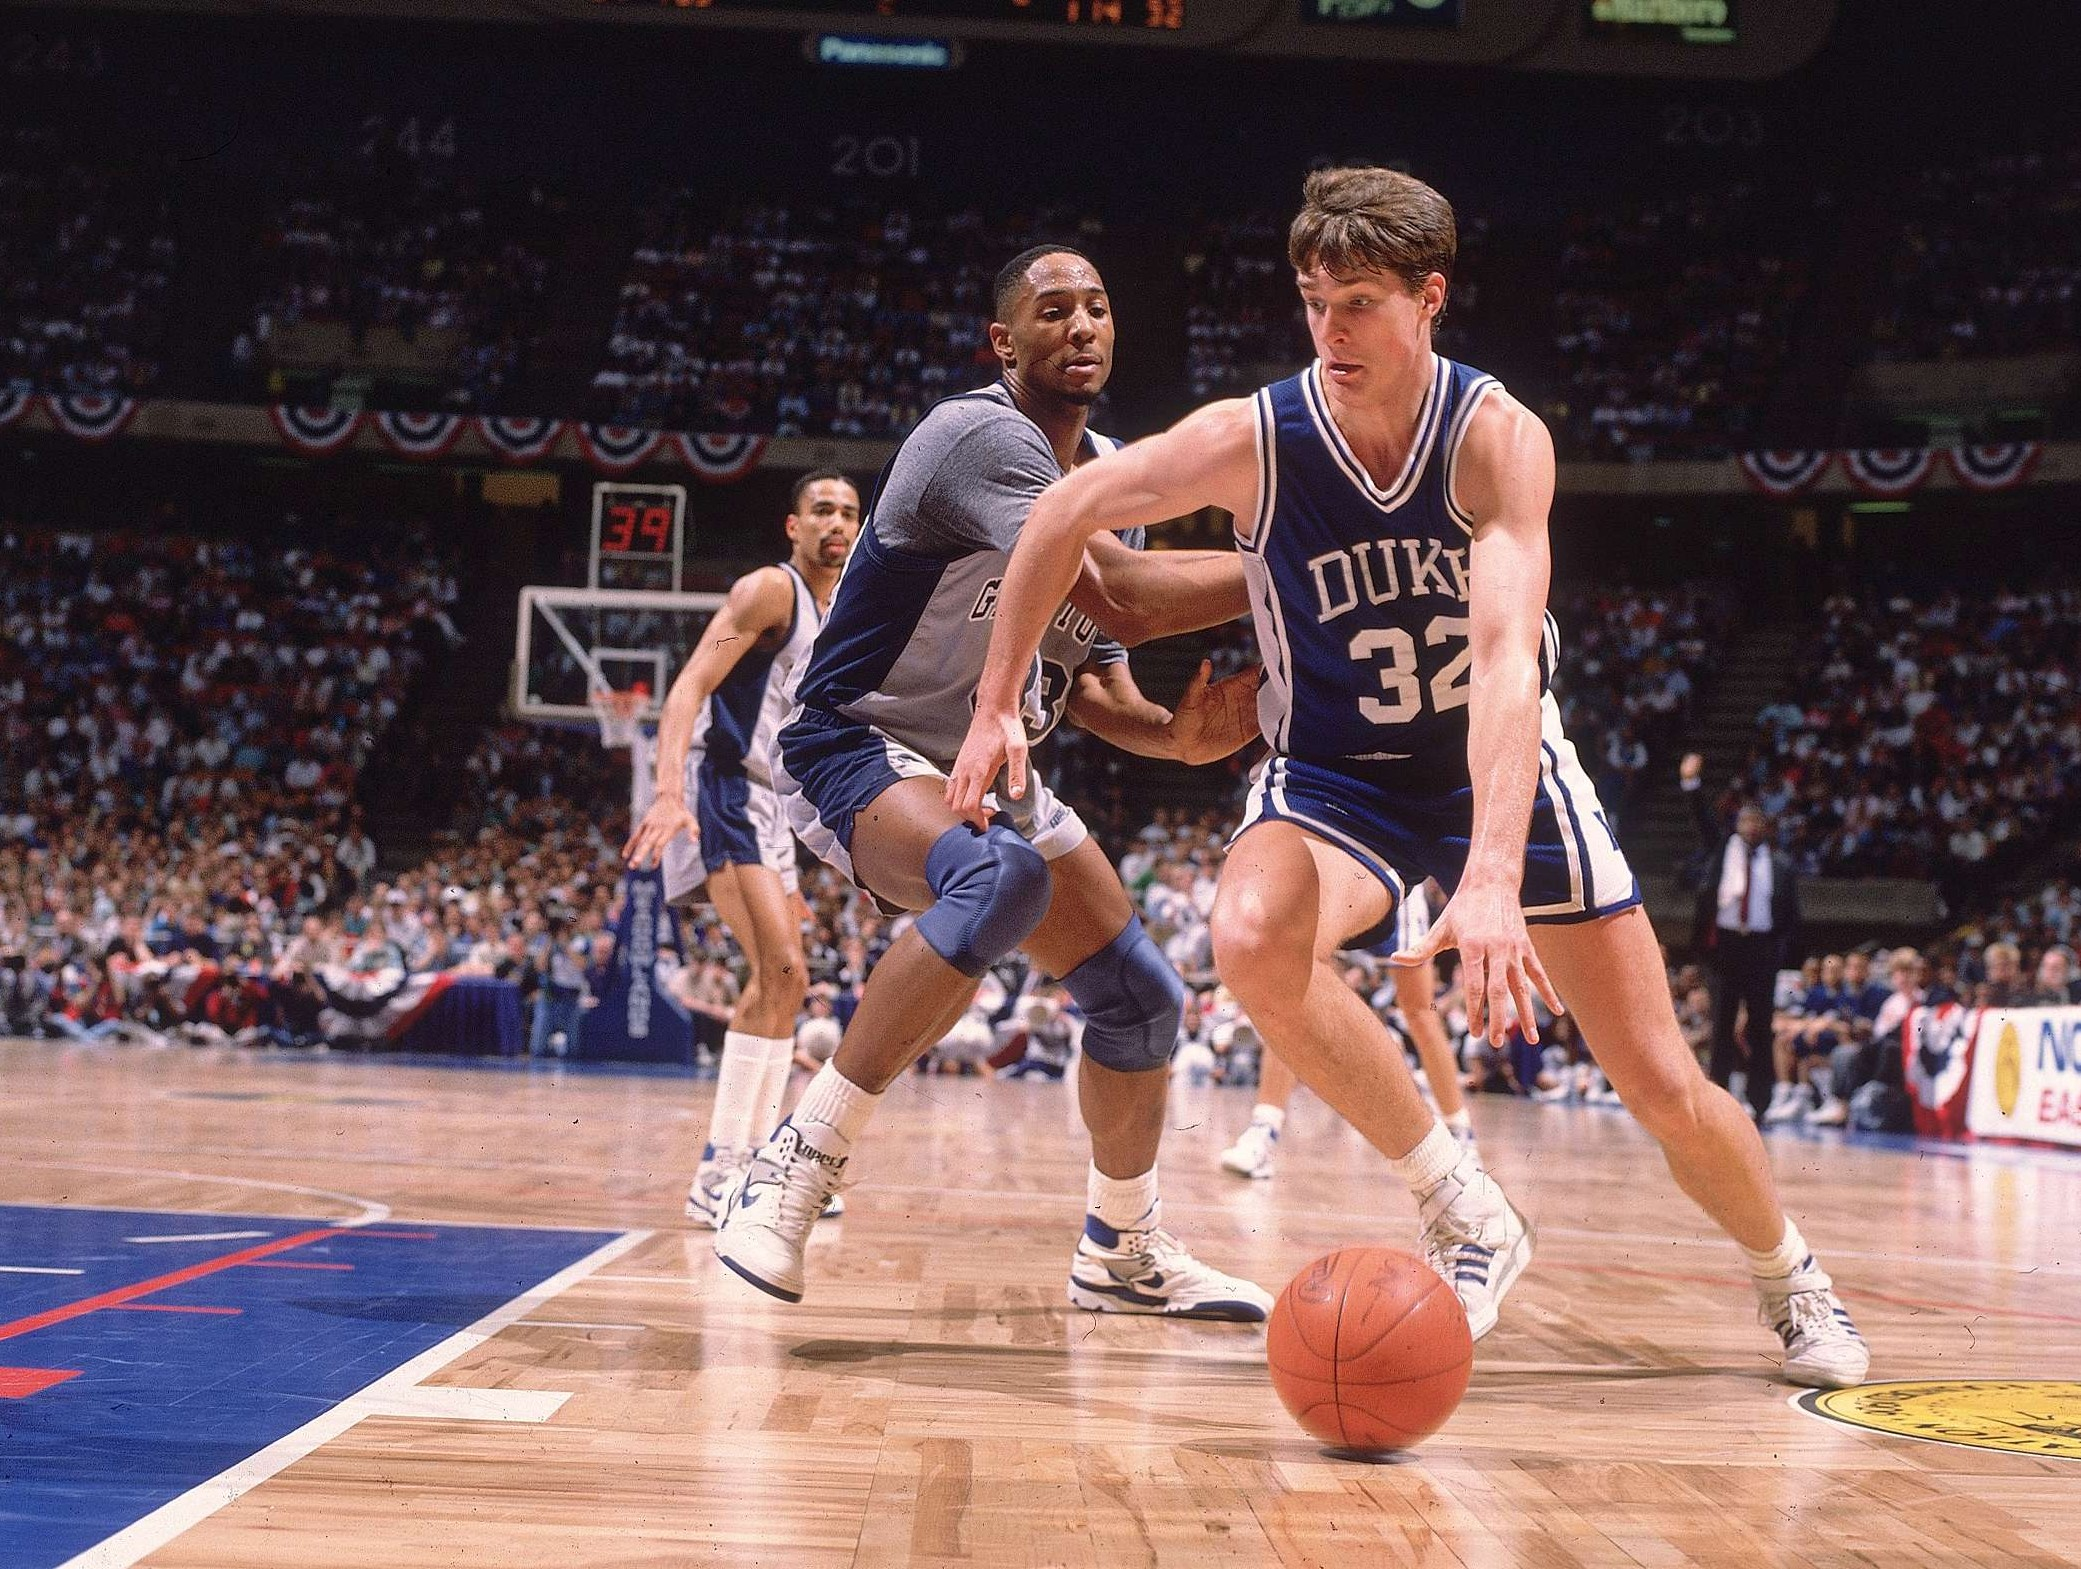 Georgetown University vs Duke University, 1989 NCAA East Regional Finals